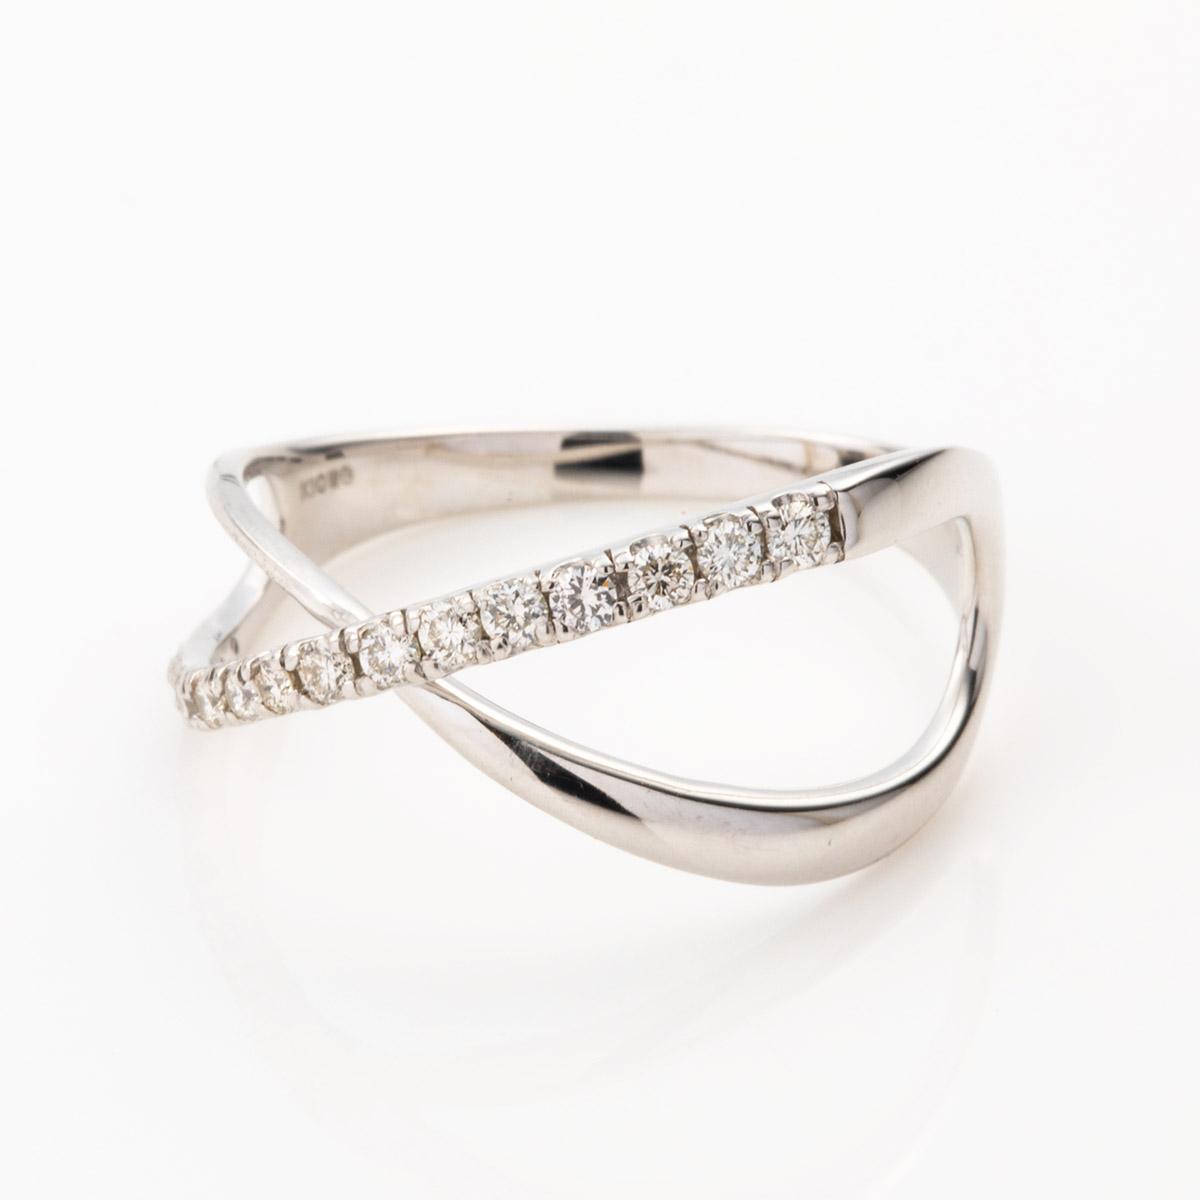 K10WG ダイヤモンド クロスリング